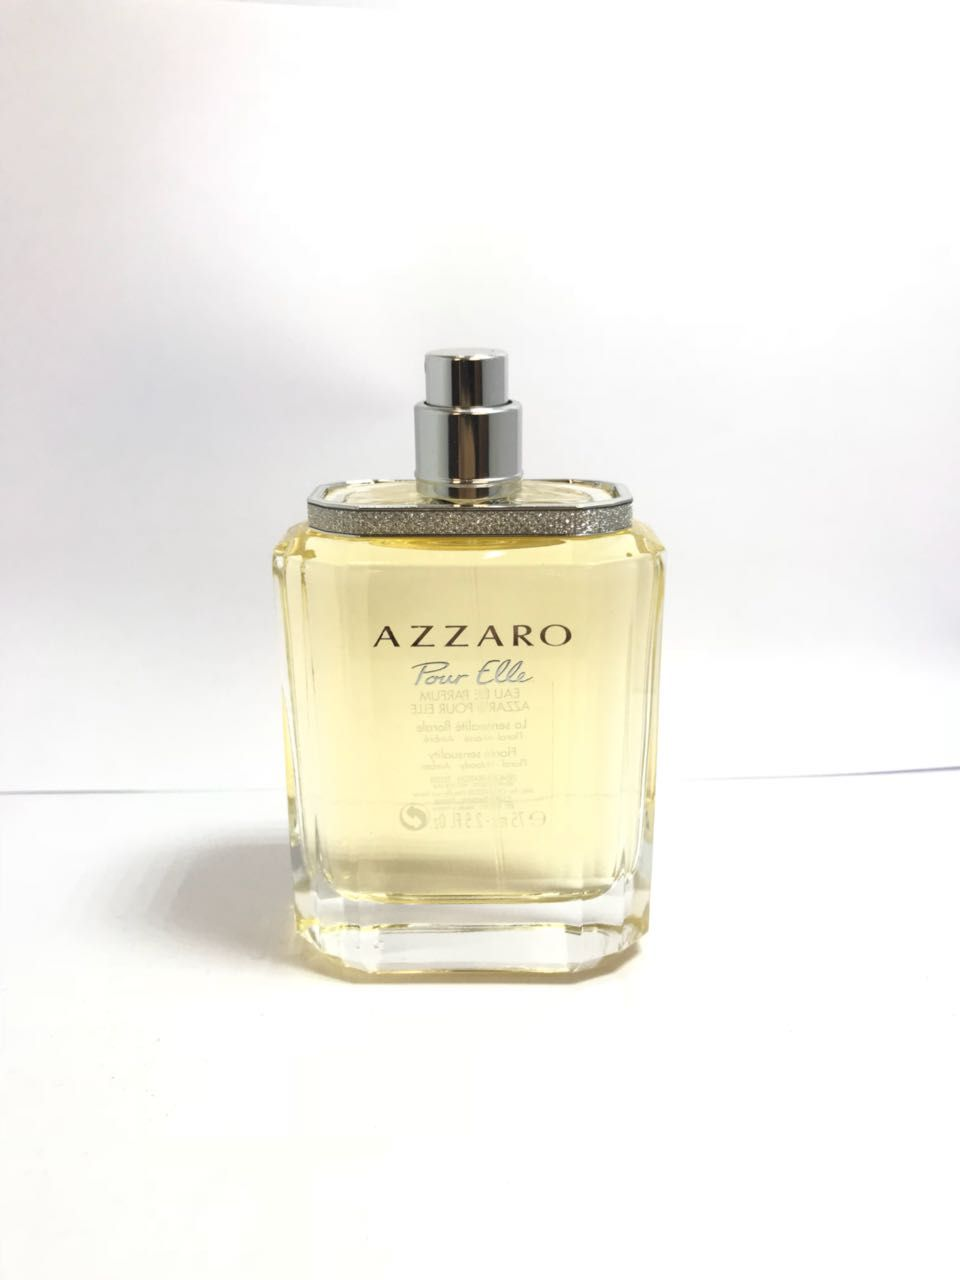 Pour Elle Azzaro Feminino Eau de Parfum 75ML - Tester